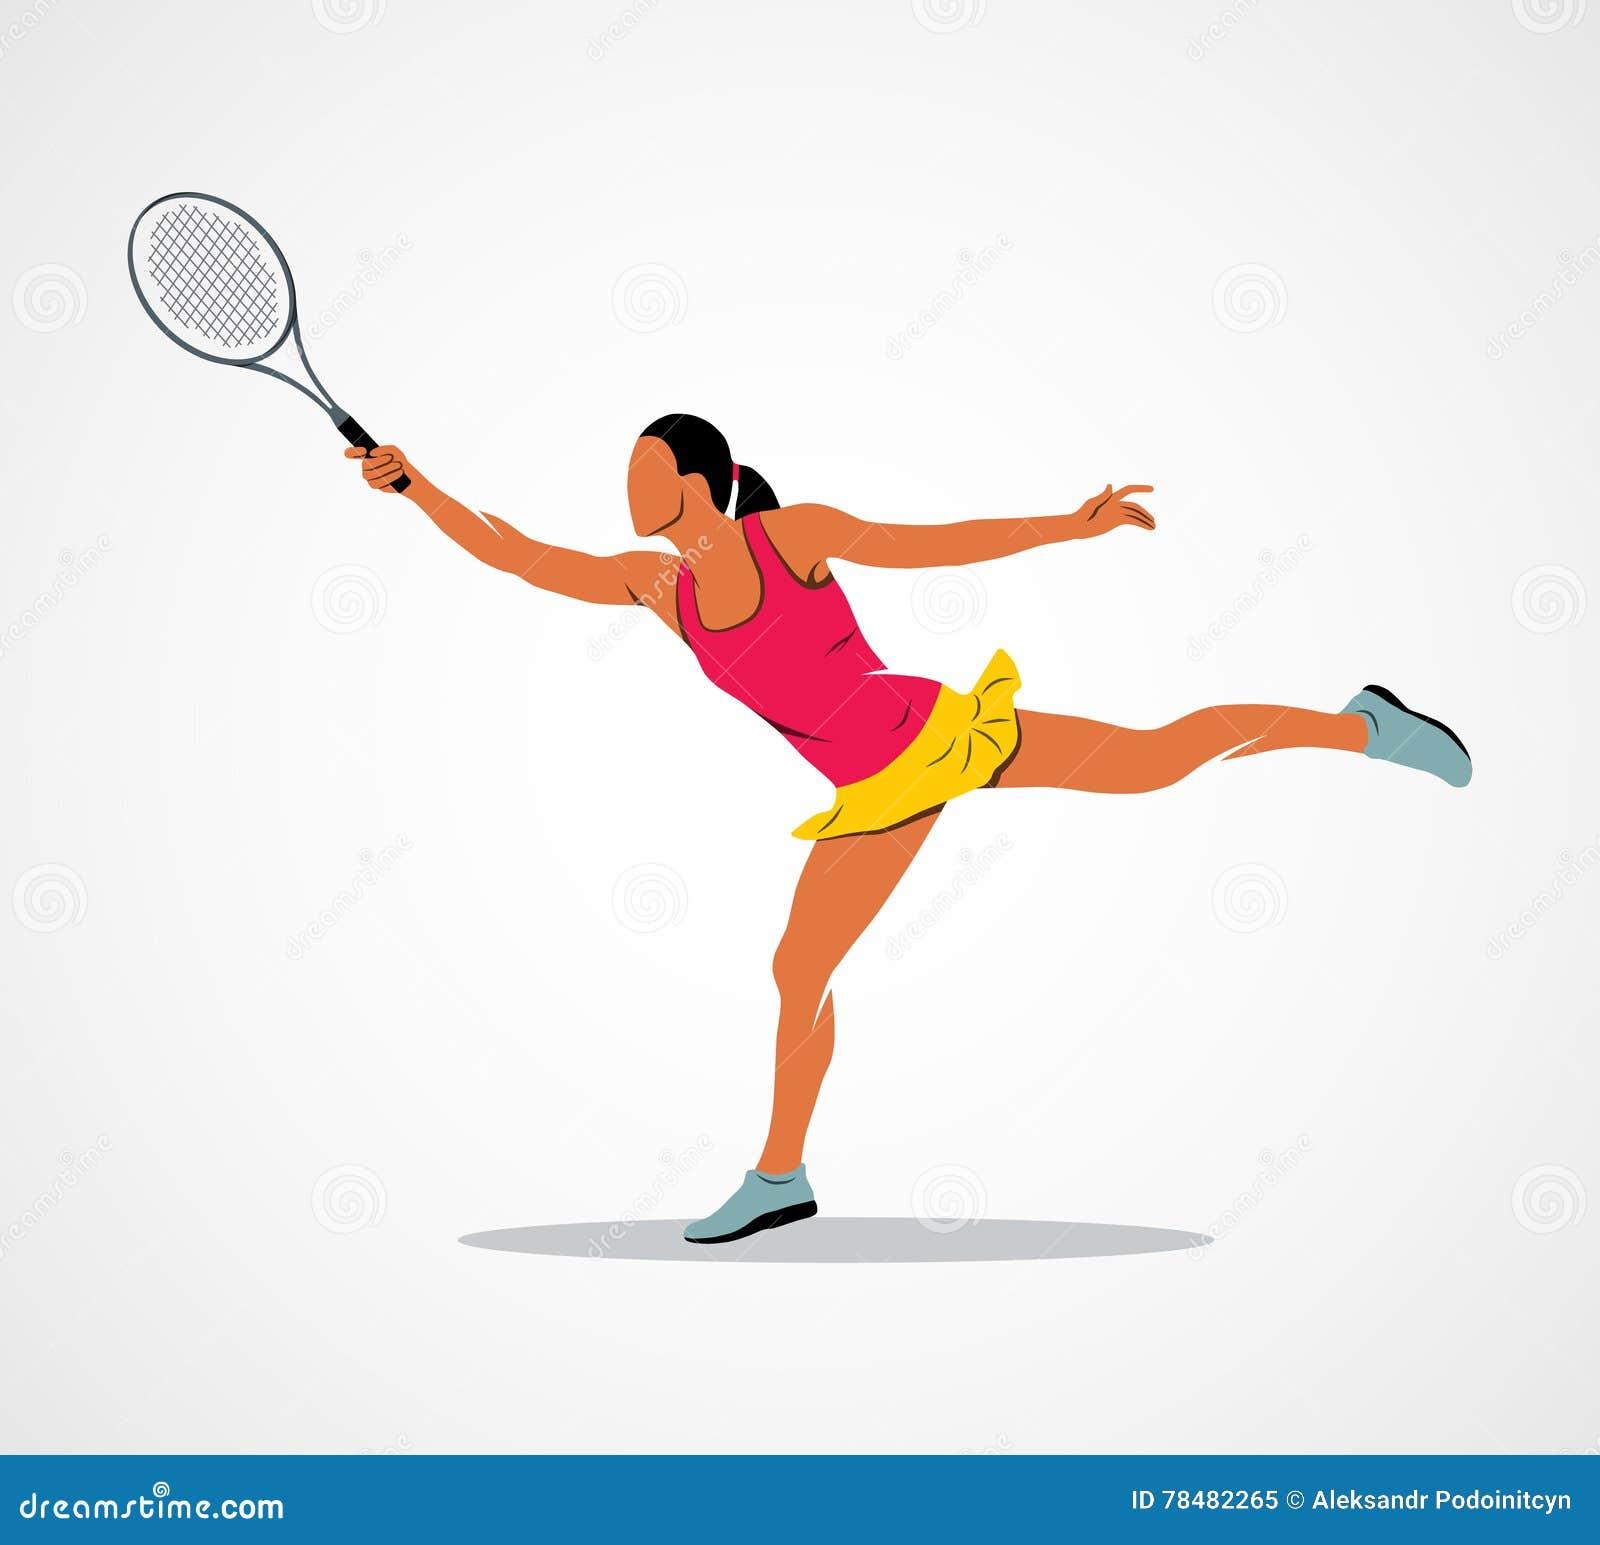 Tennis Racket Athlete Stock Vector Illustration Of Motion 78482265